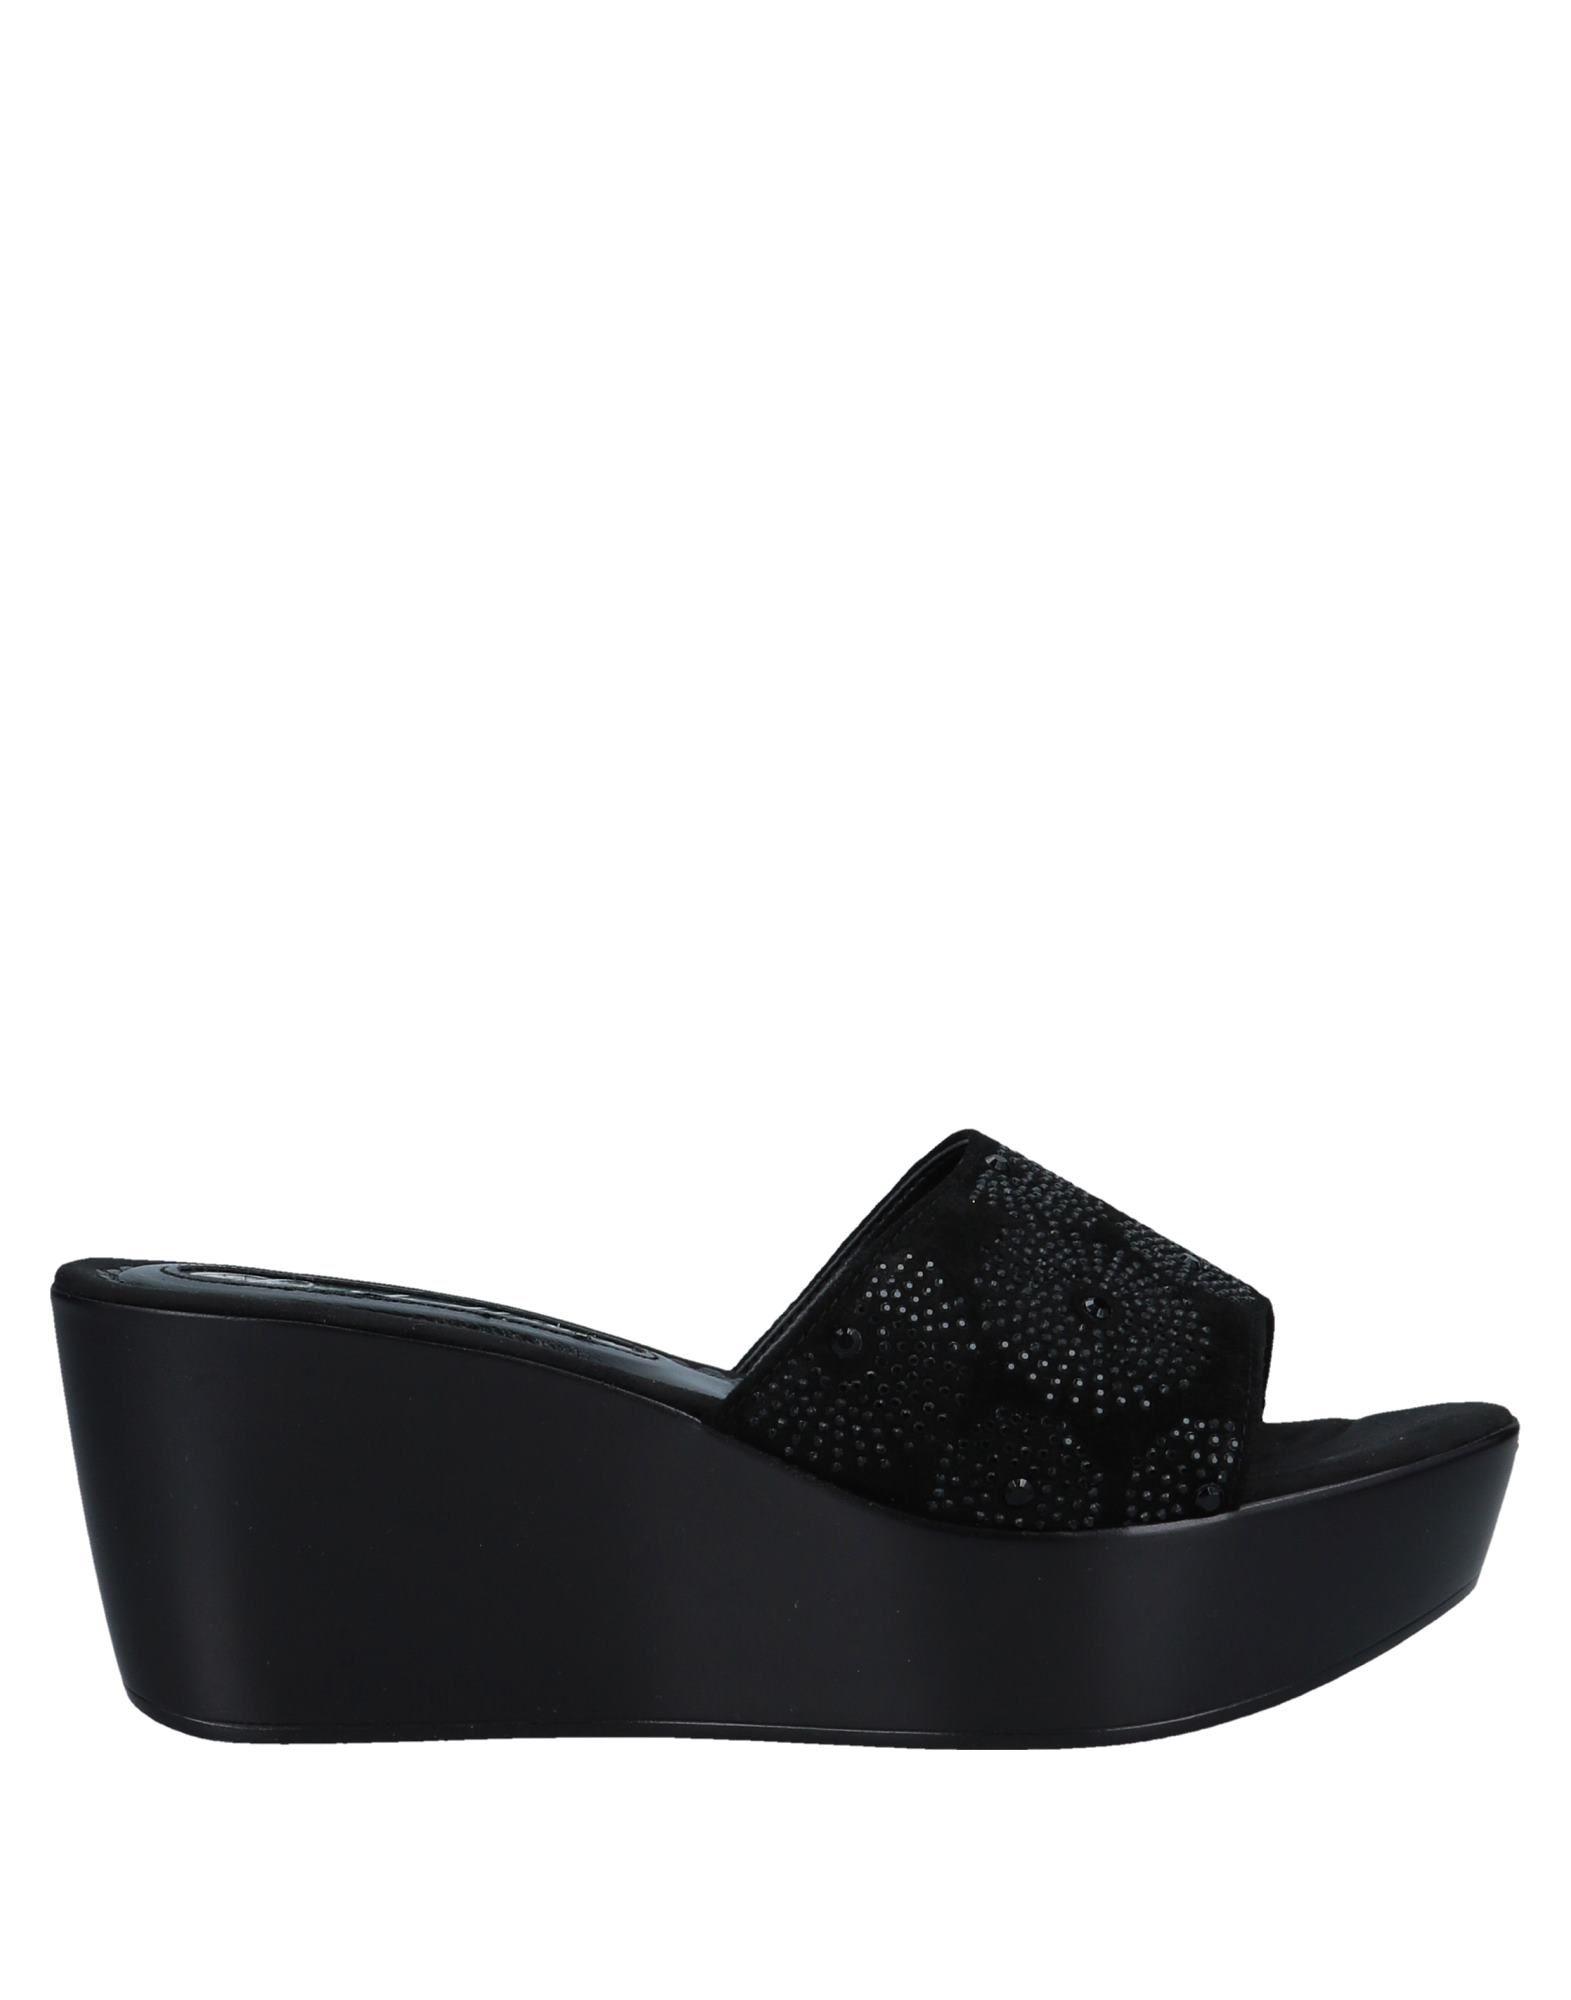 David Haron Sandalen Damen  11554212WU Gute Qualität beliebte Schuhe